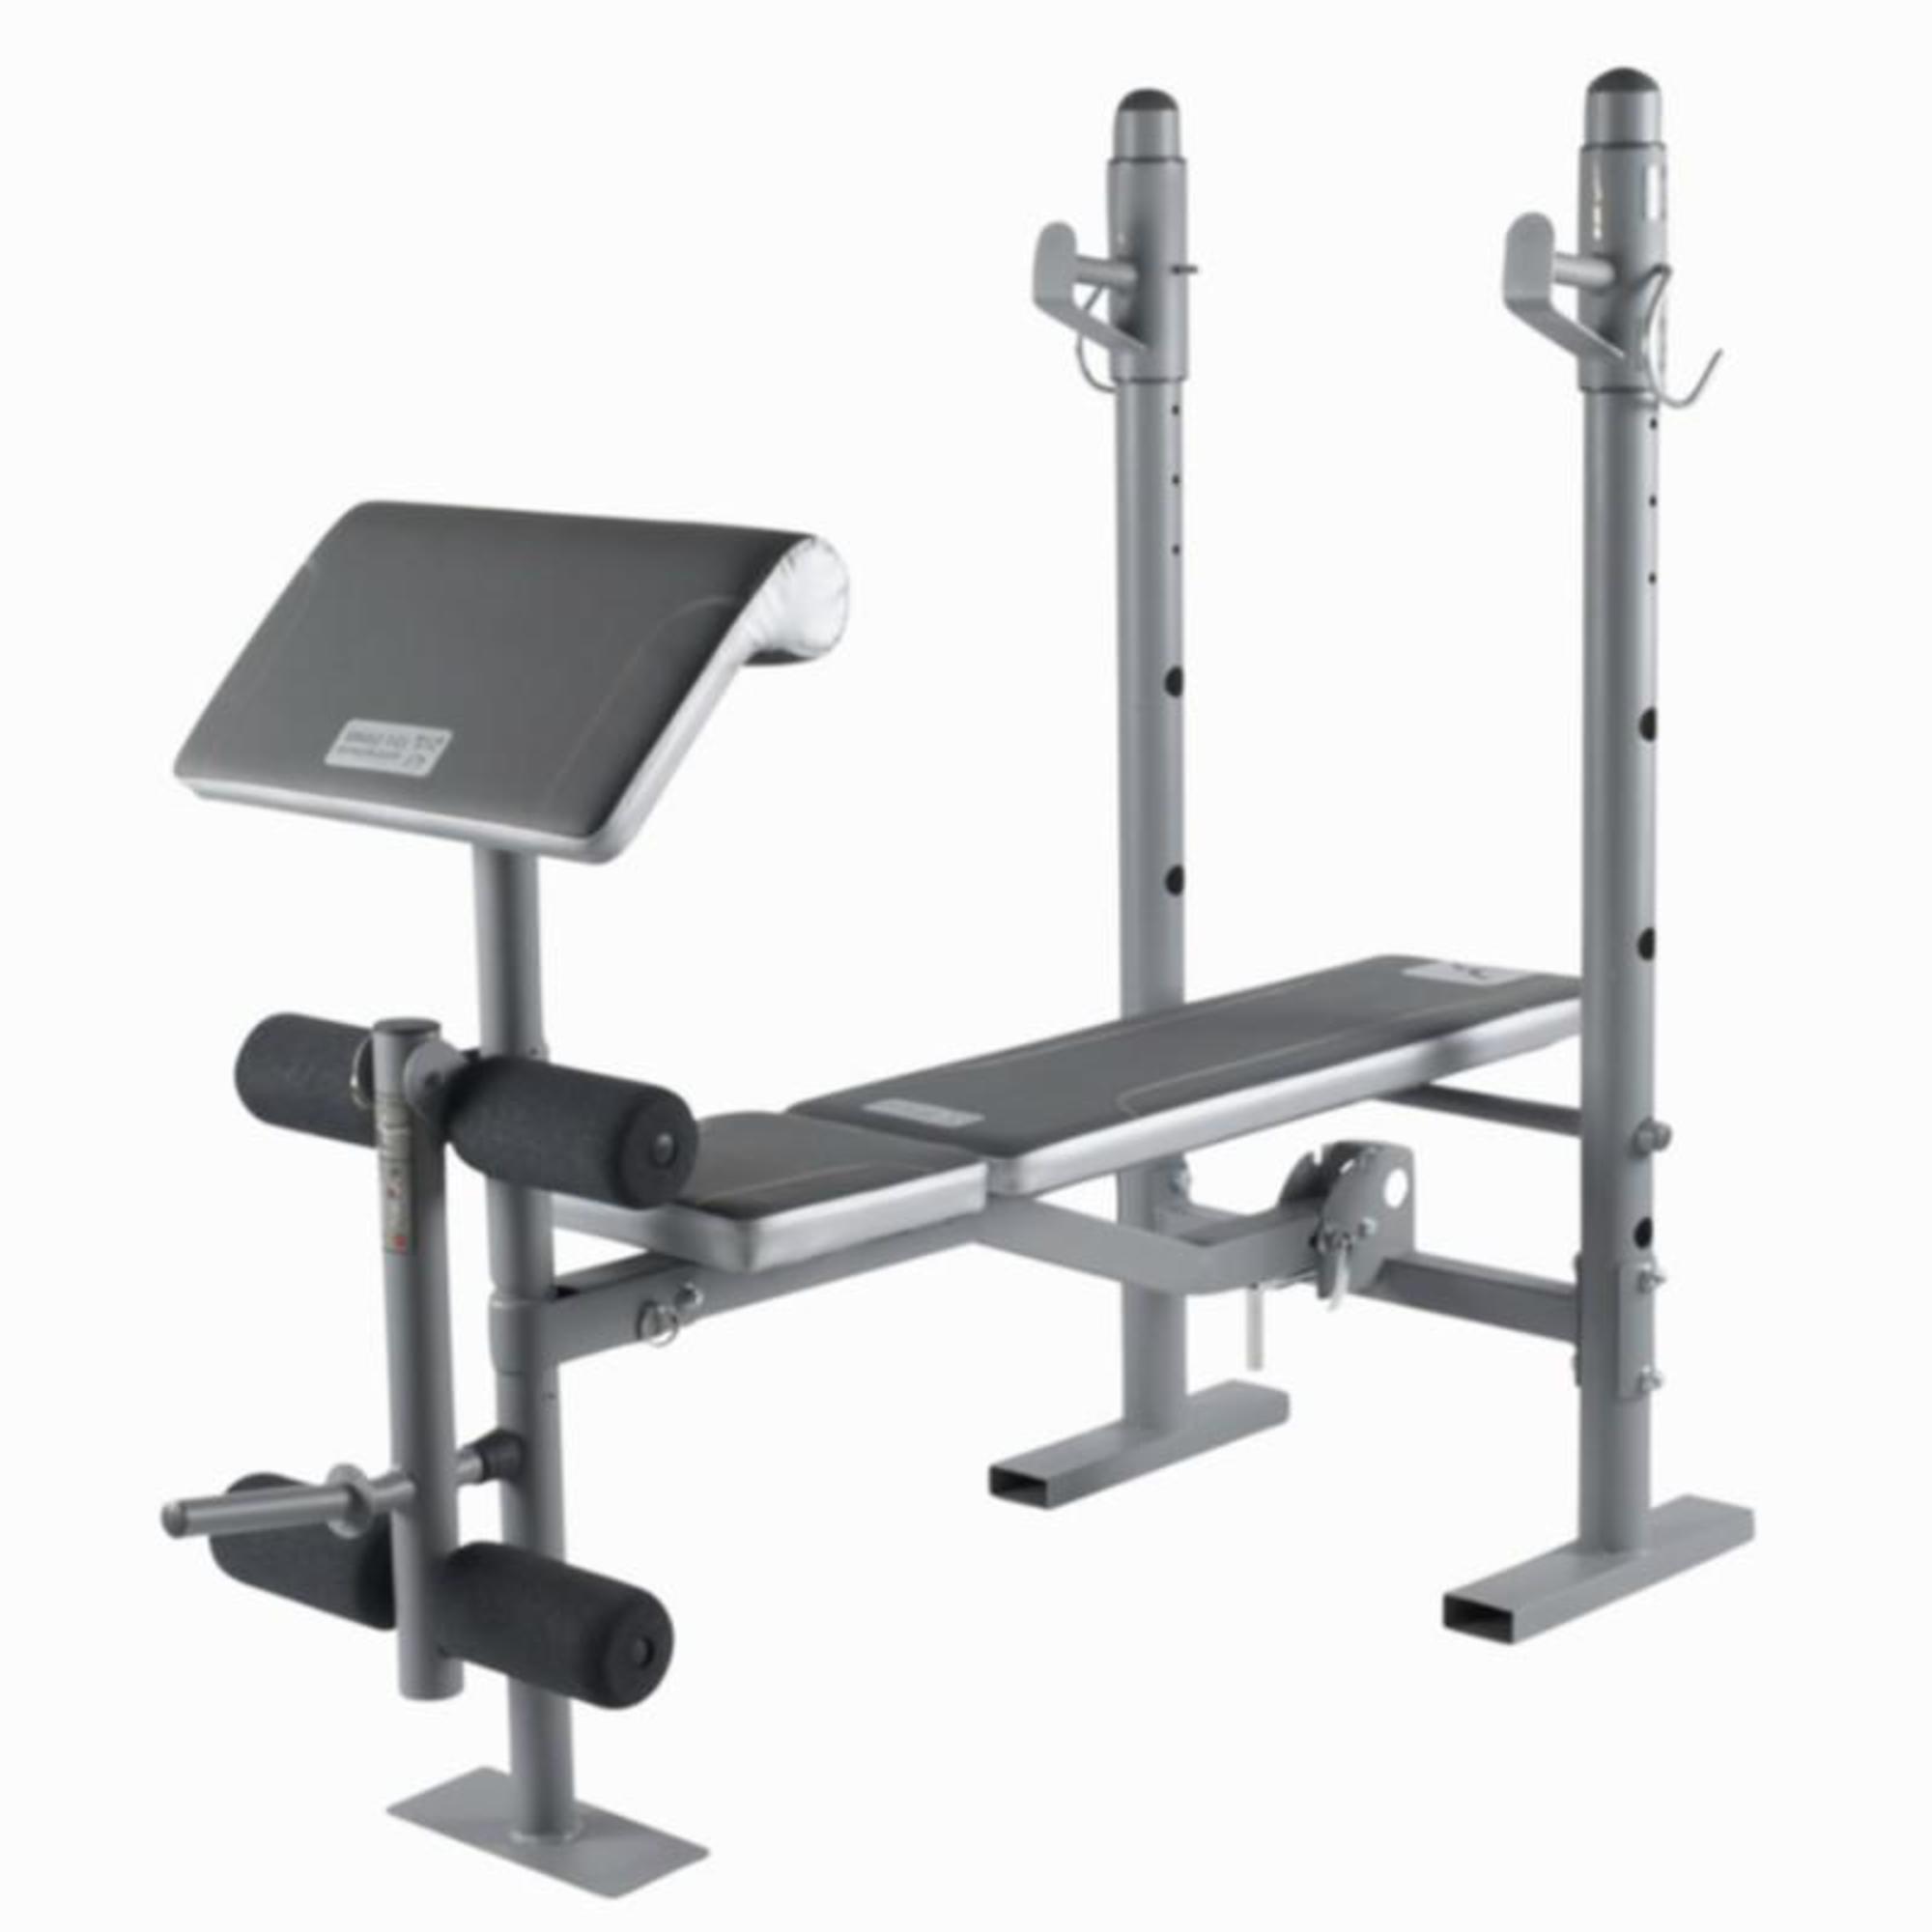 Bm210 Weights Bench Domyos By Decathlon